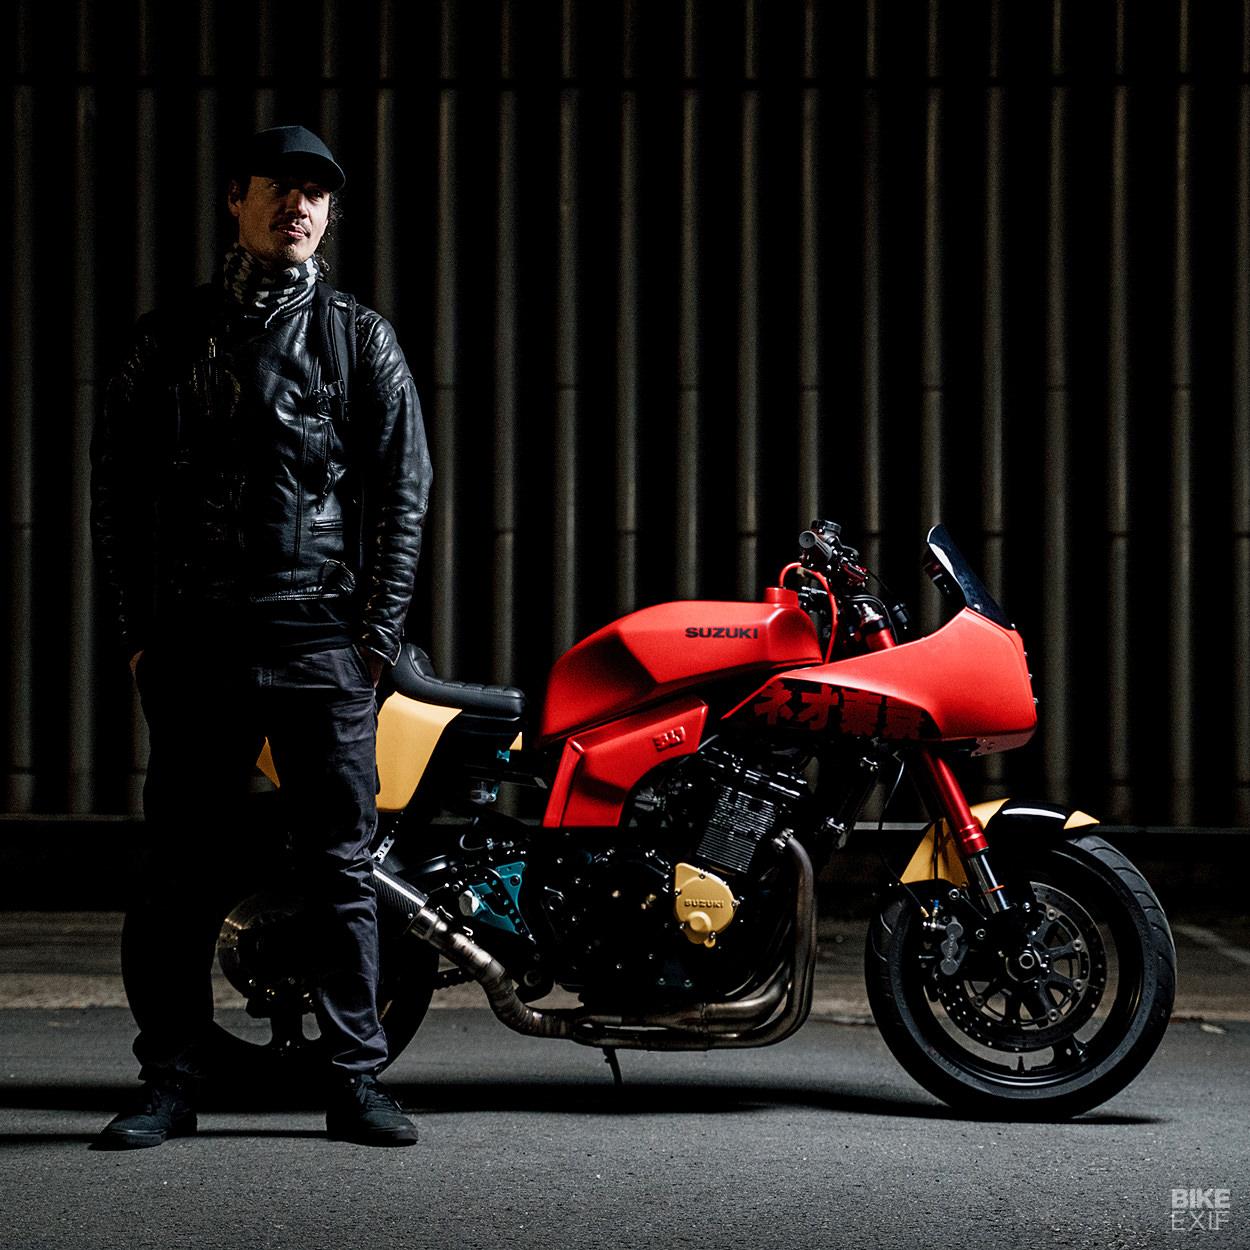 Michel Szozda and his custom Suzuki GSX-R750 slabby